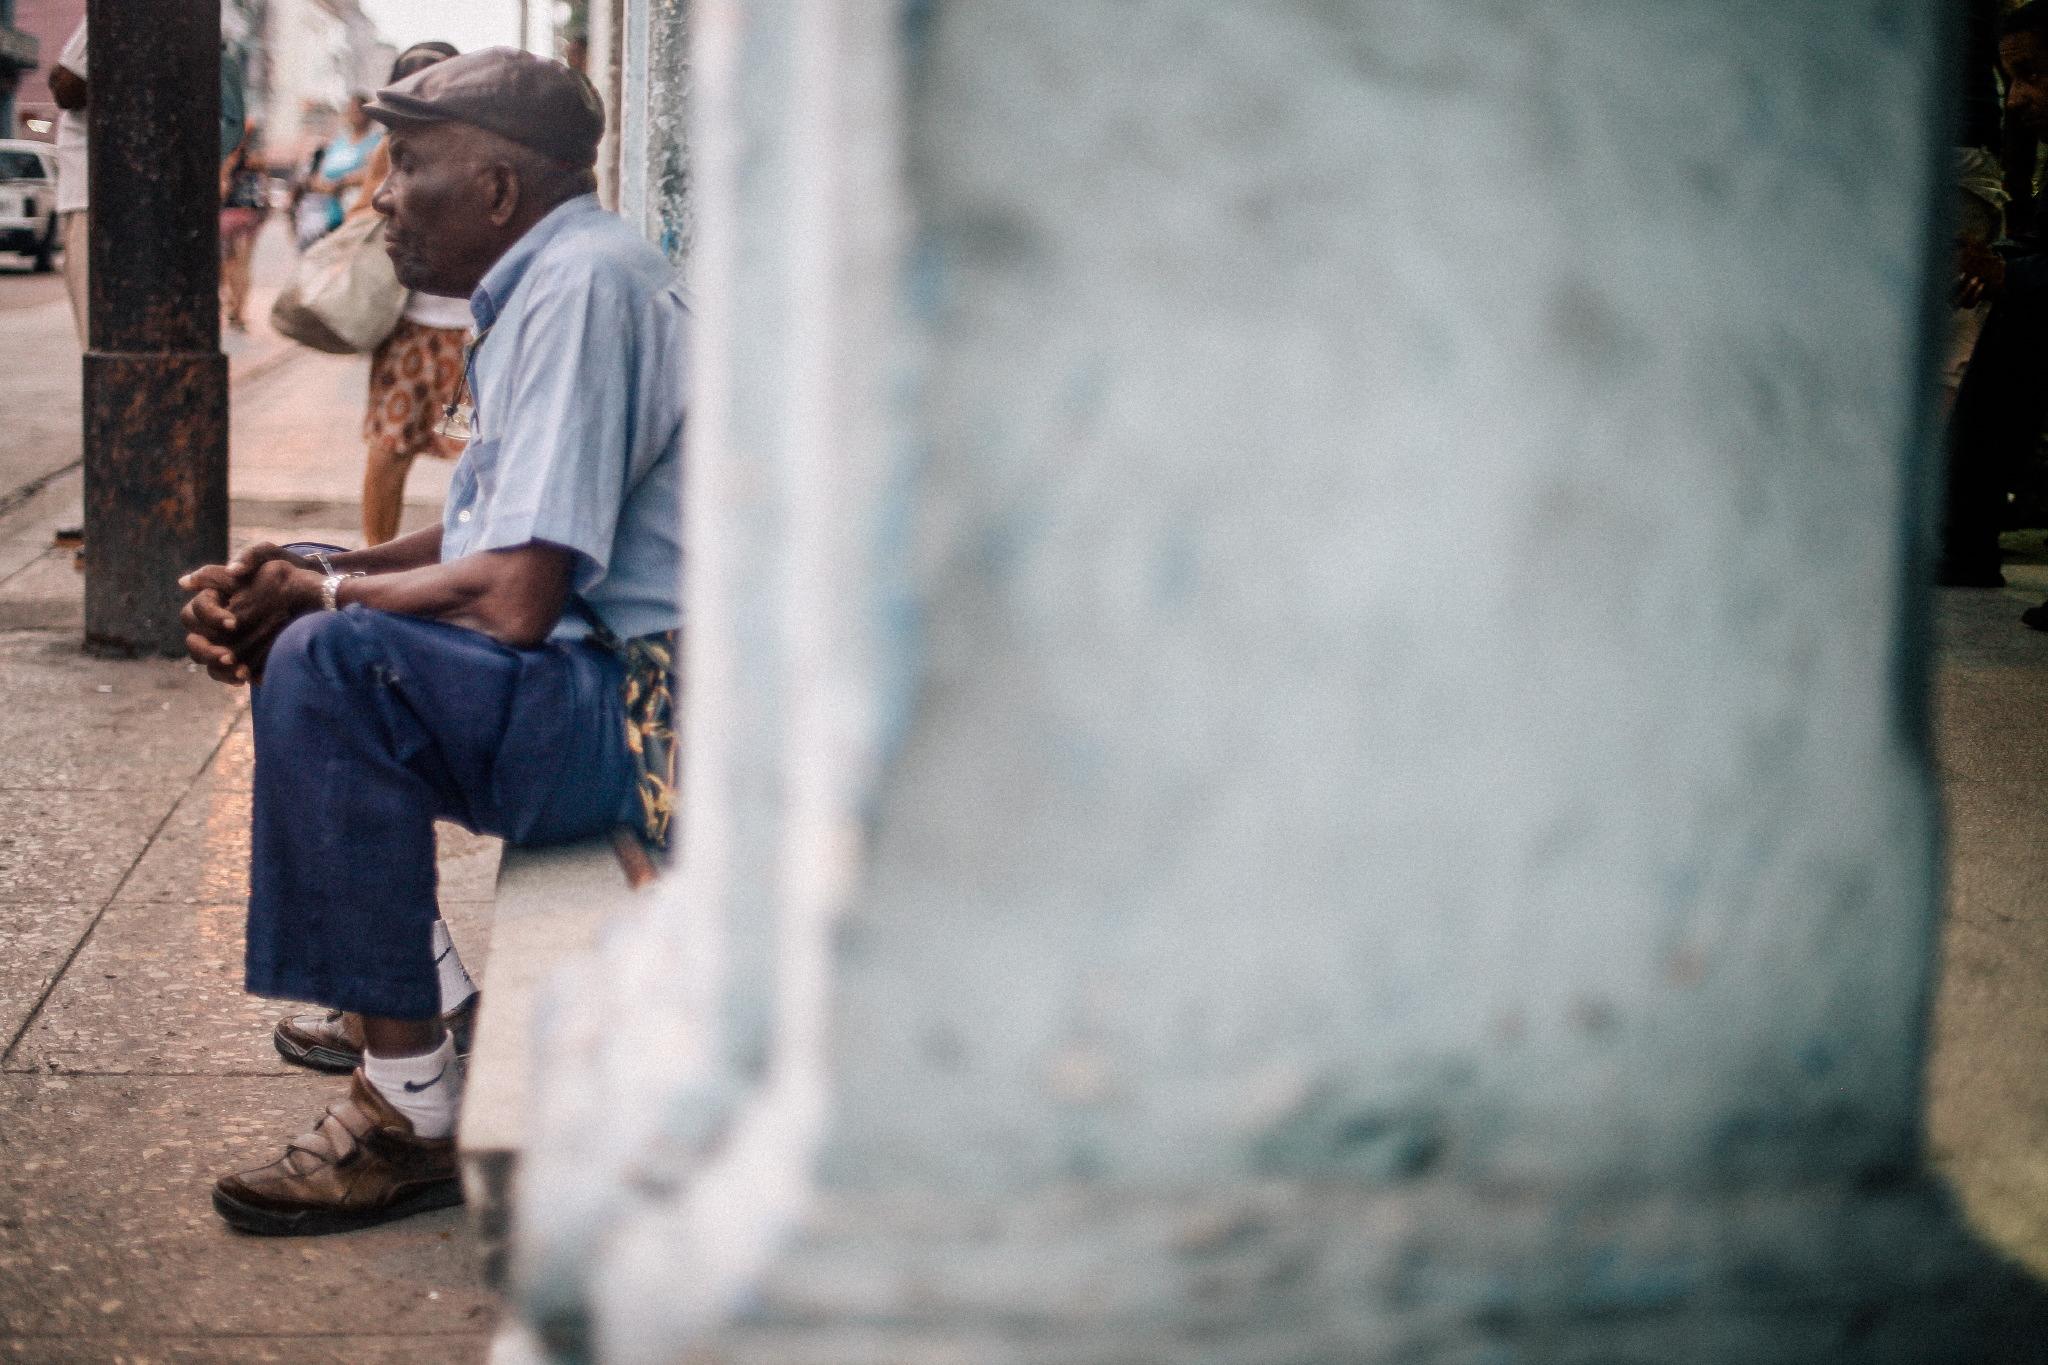 san diego wedding   photographer | shot of middle aged man sitting on windowsill